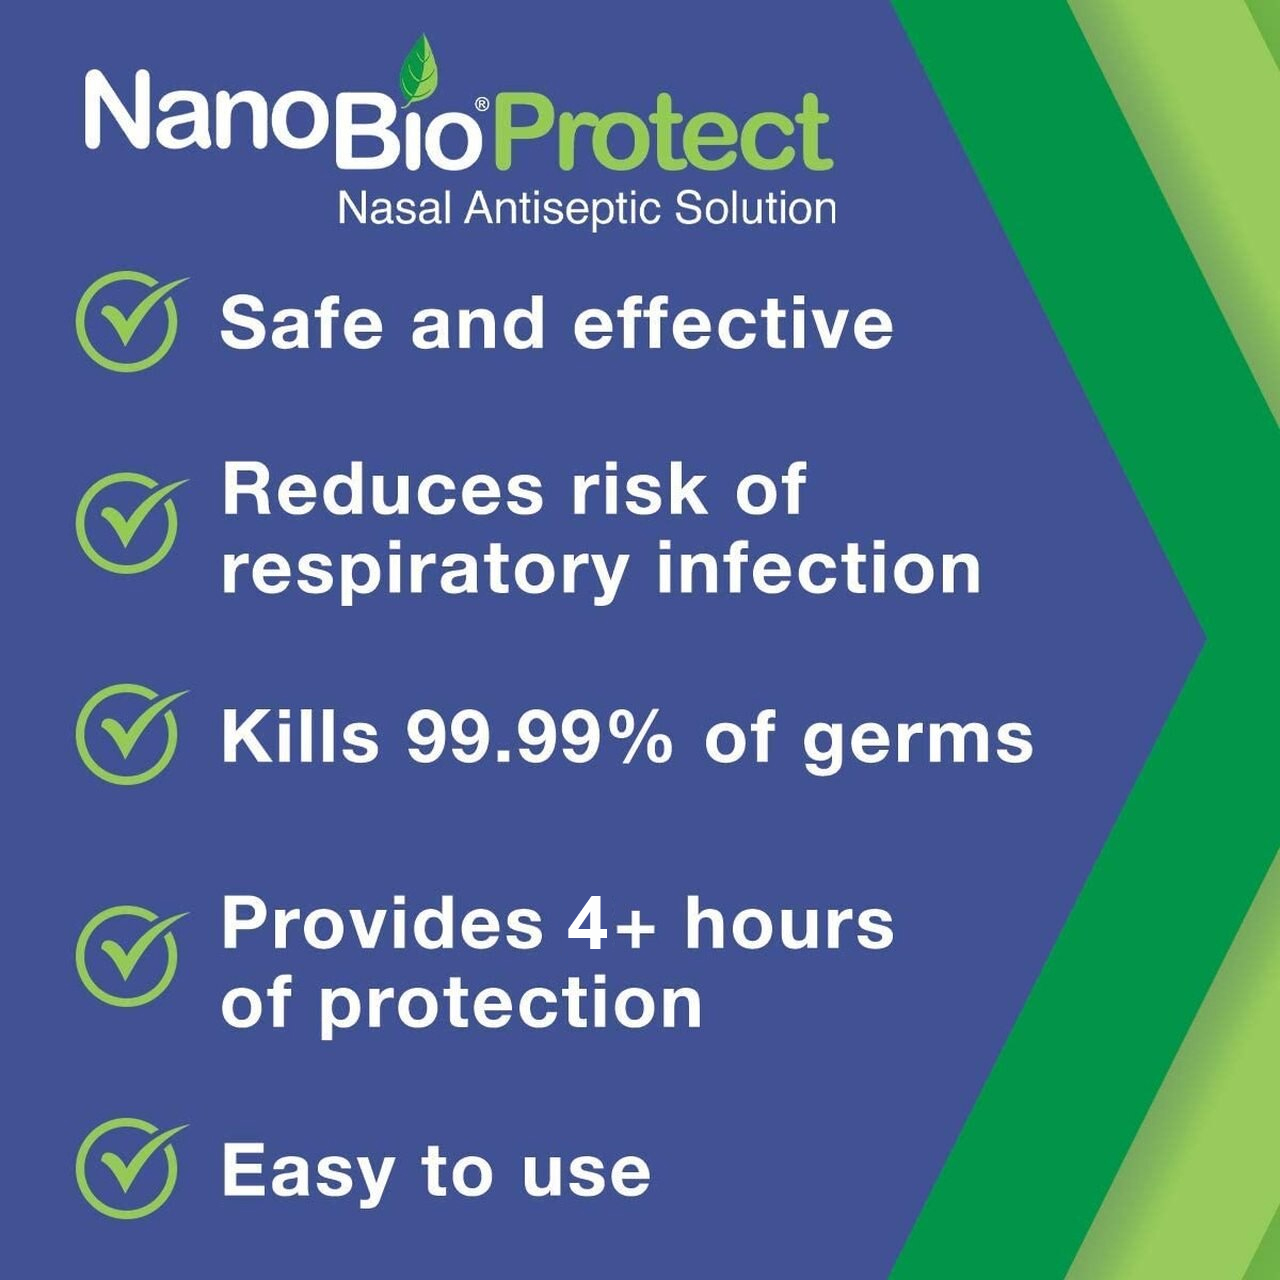 NanoBio Protect Nasal Sanitizer Safe and Effective image